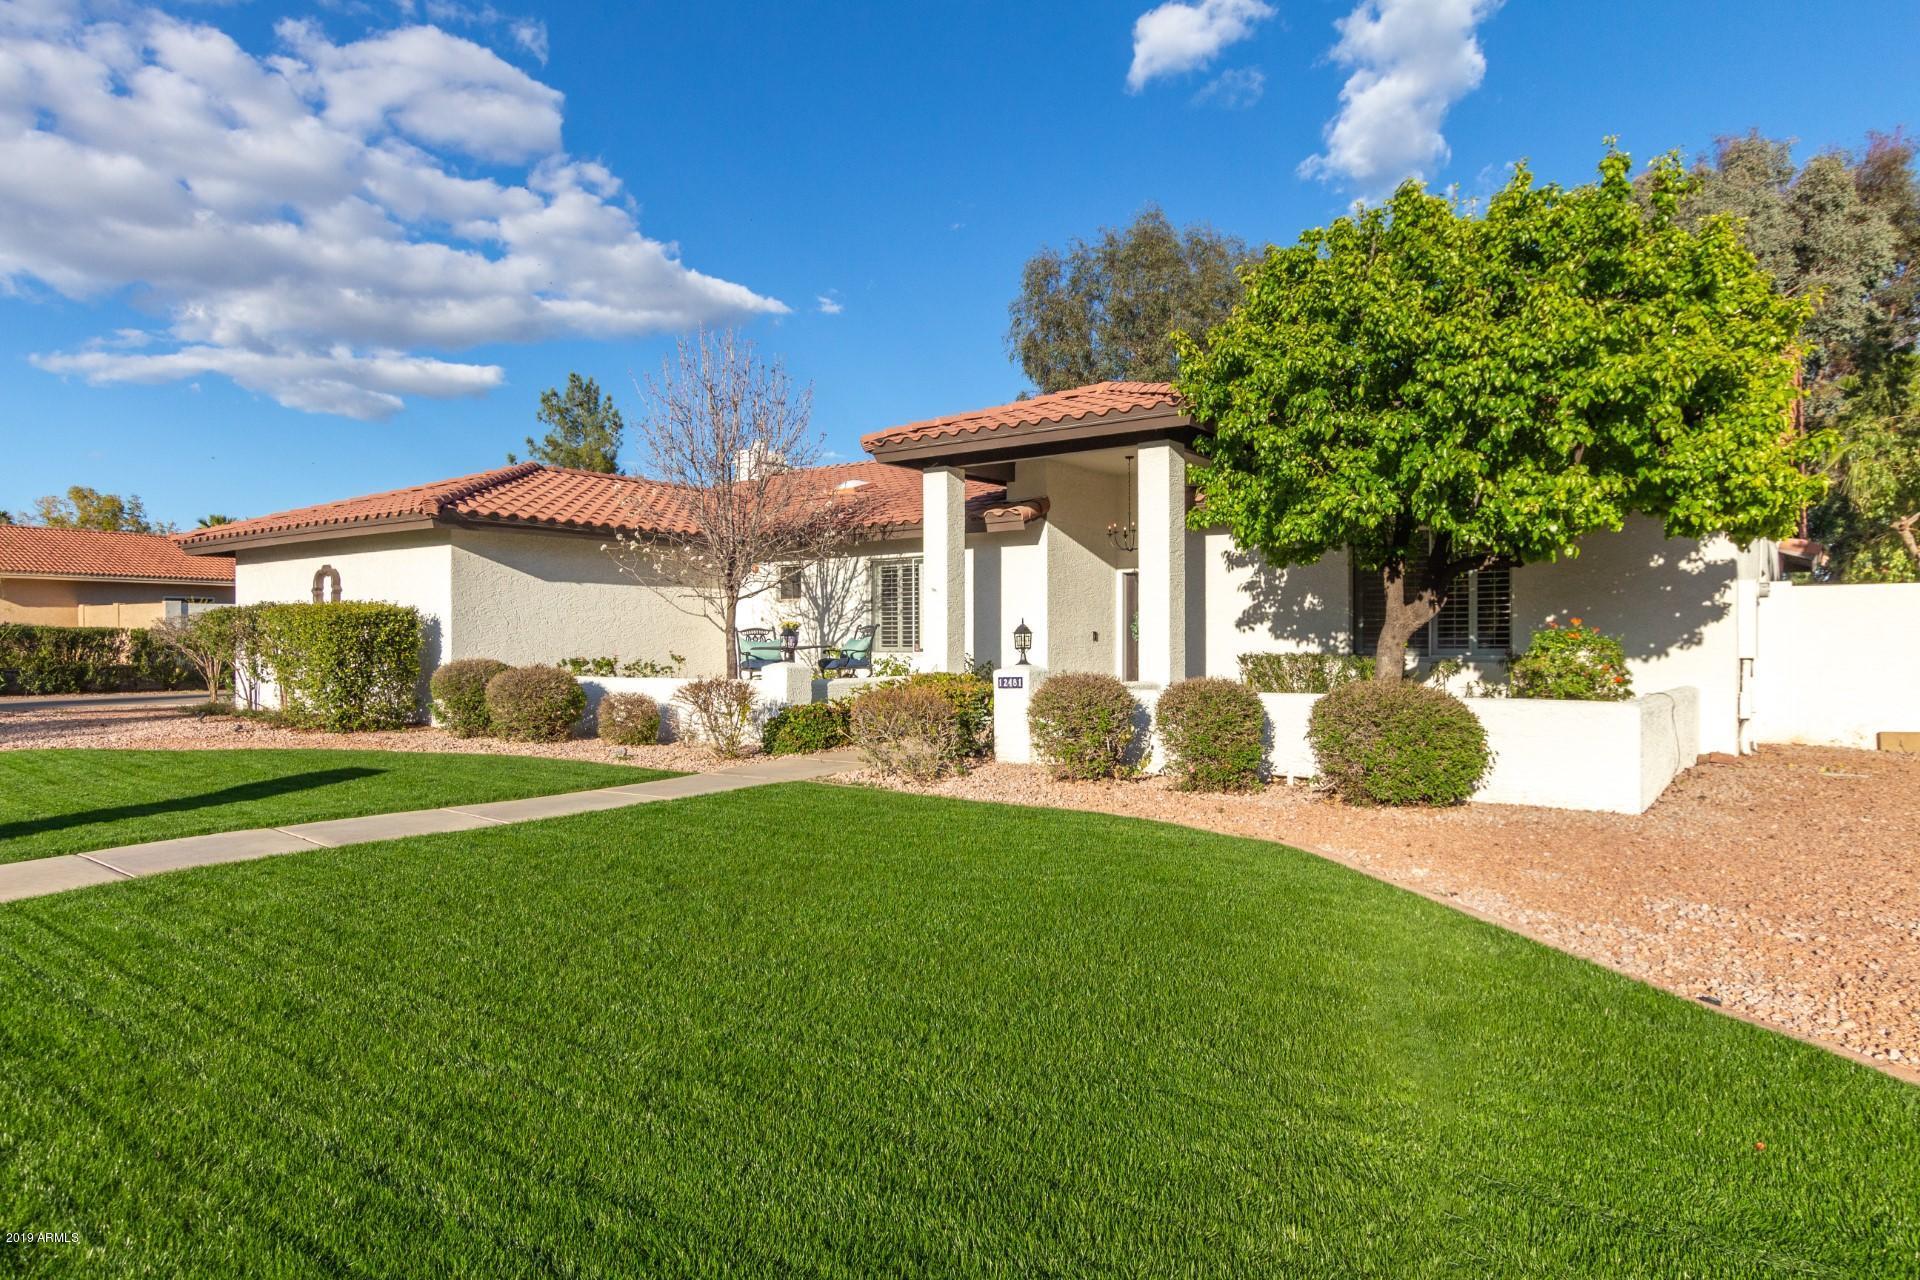 12481 N 86TH Street, Scottsdale AZ 85260